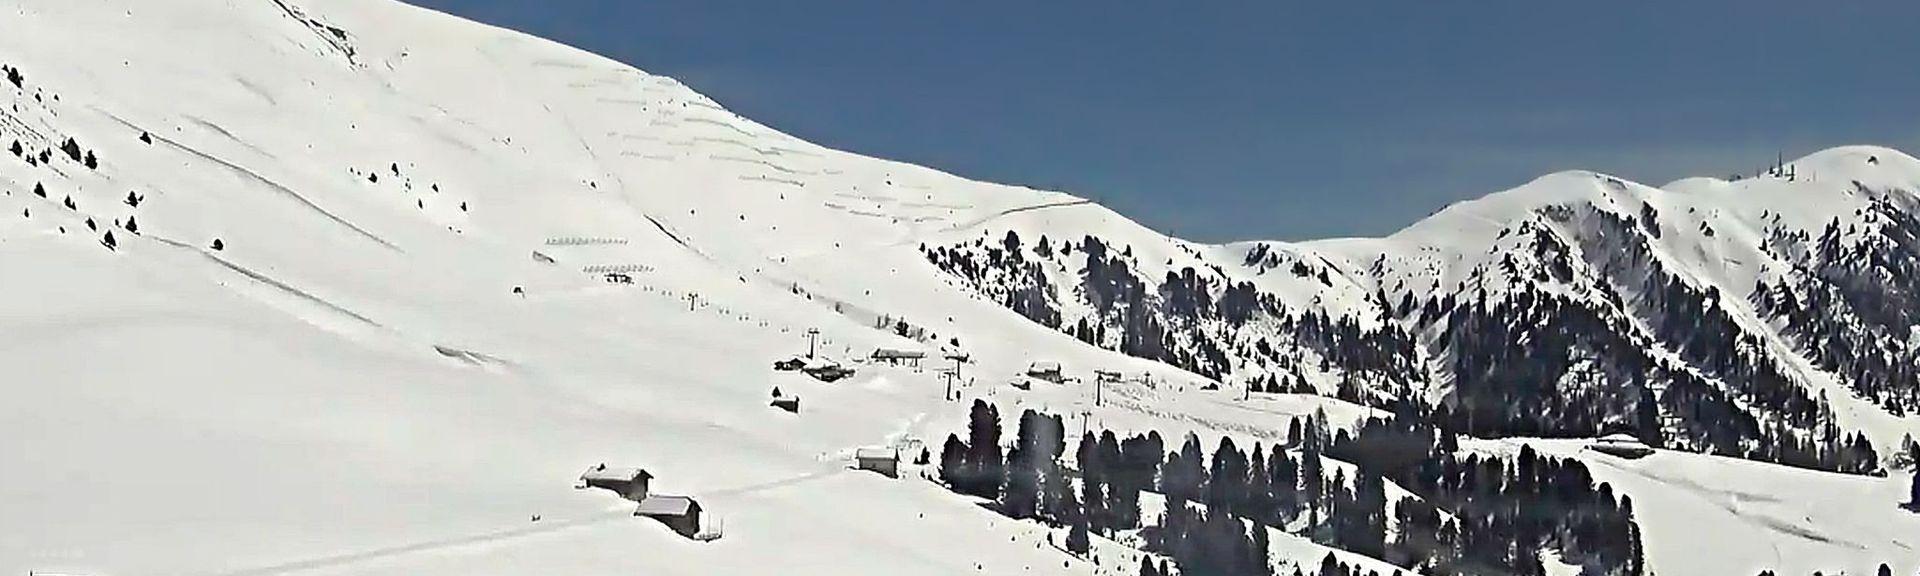 Piza Pranseies Ski Lift, Selva di Val Gardena, Trentino-Alto Adige, Italy